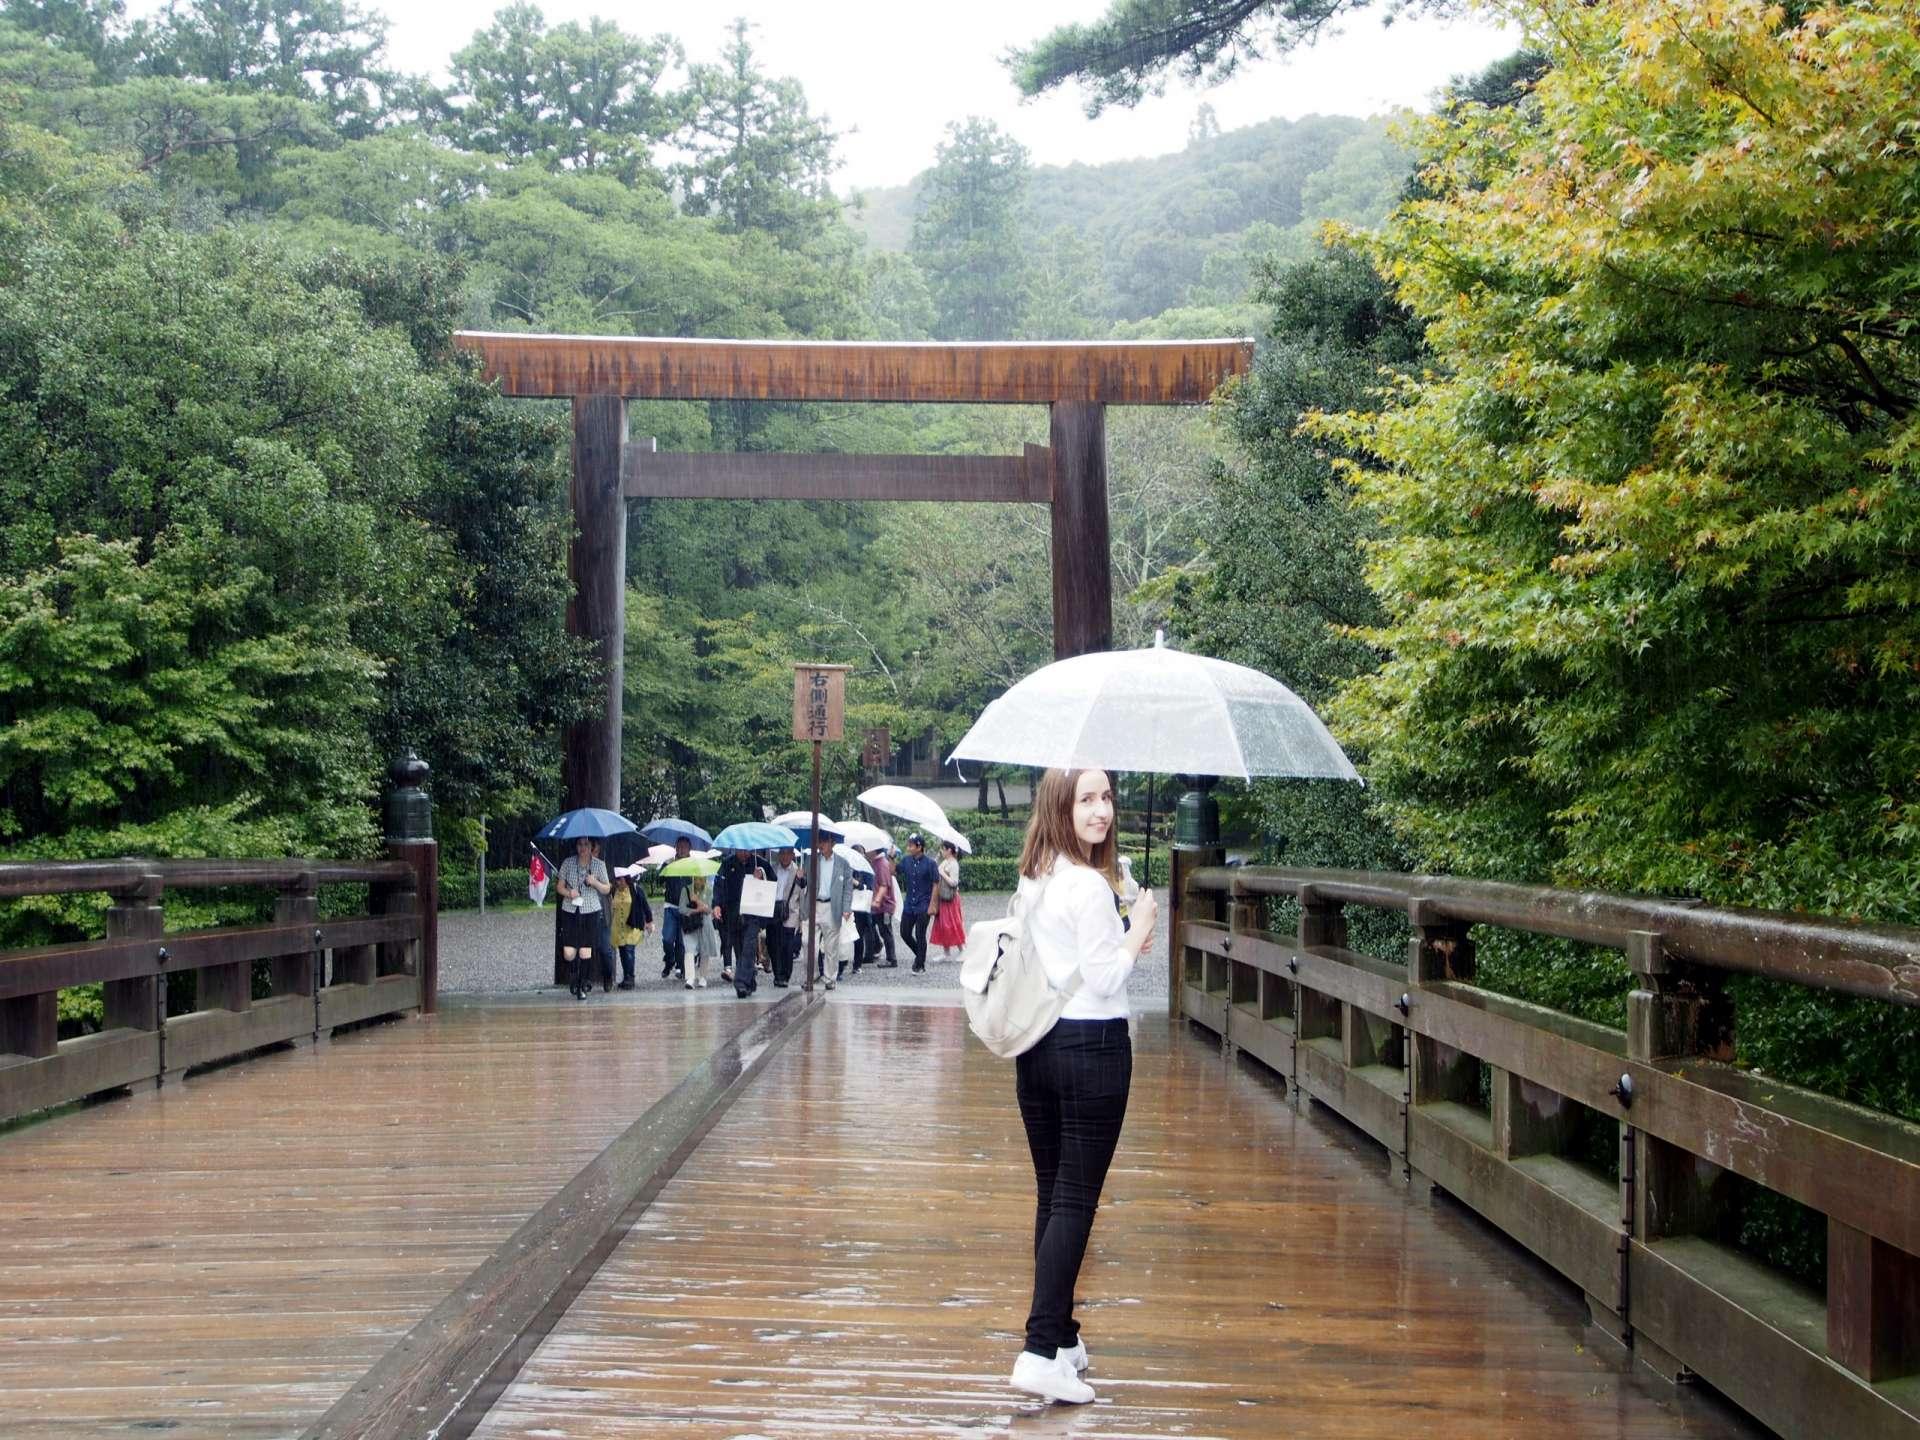 Crossing a historic-feeling bridge